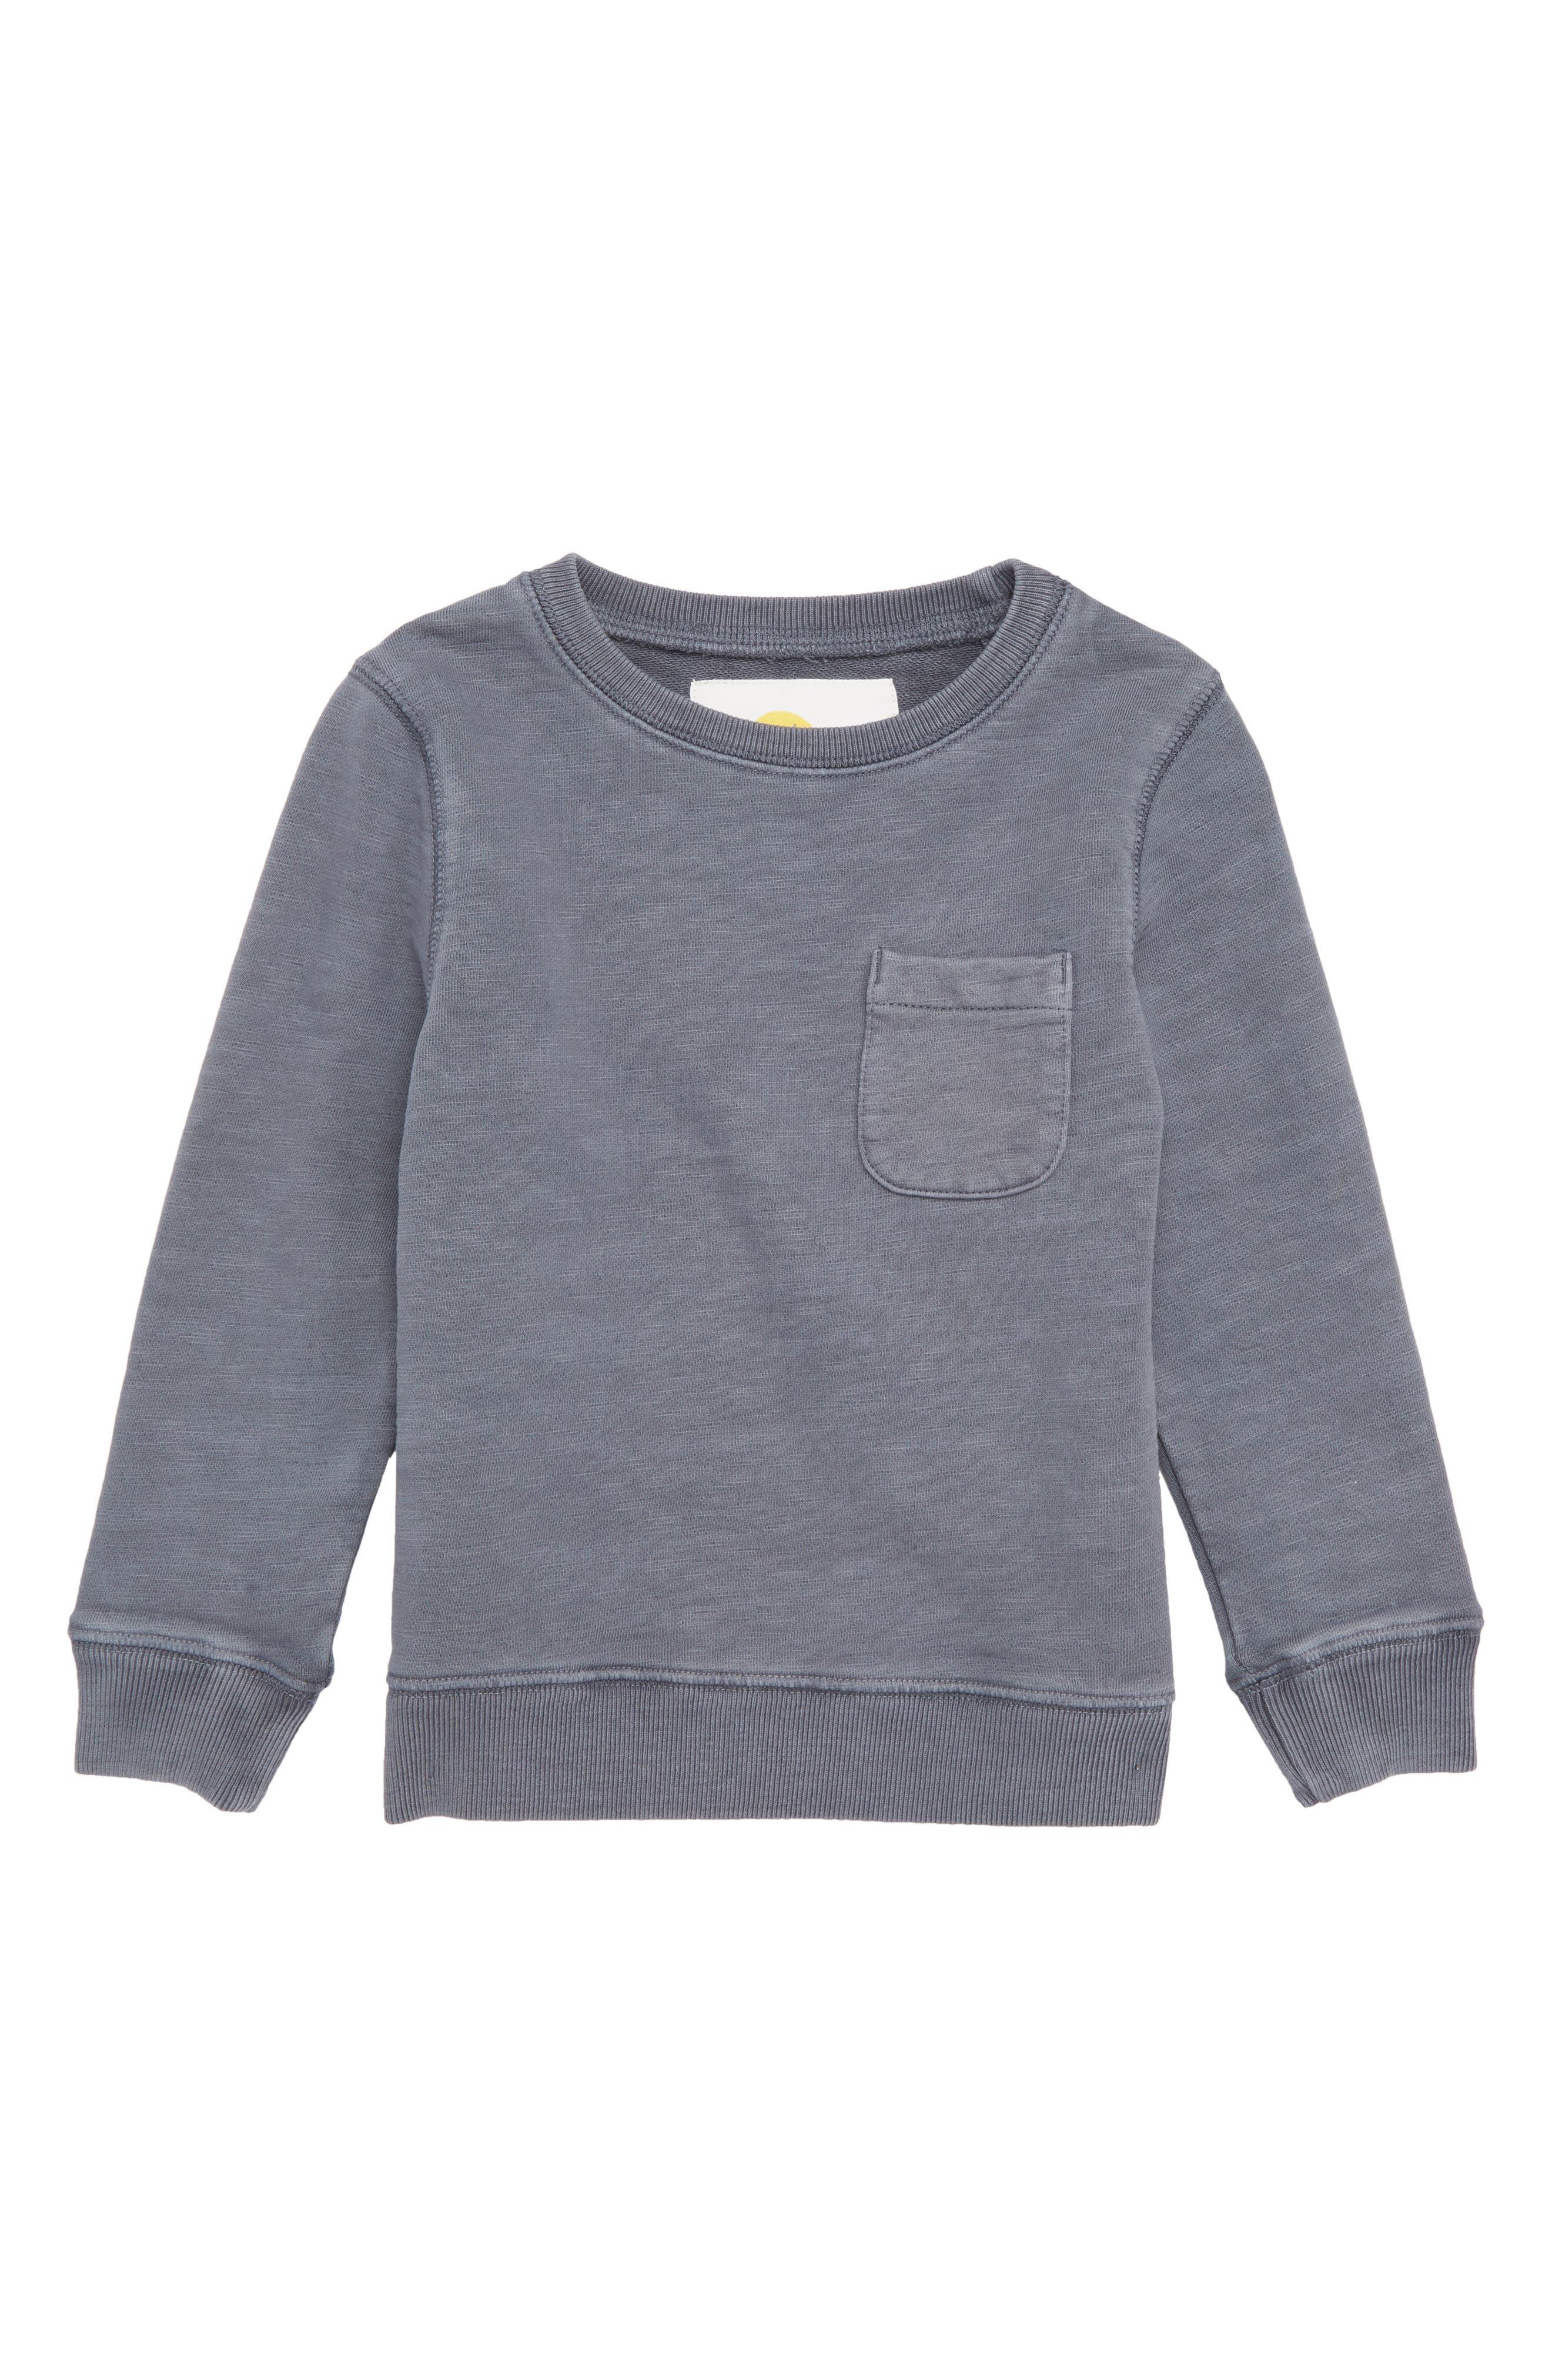 MINI BODEN,                             Pocket Crewneck Sweatshirt,                             Main thumbnail 1, color,                             062